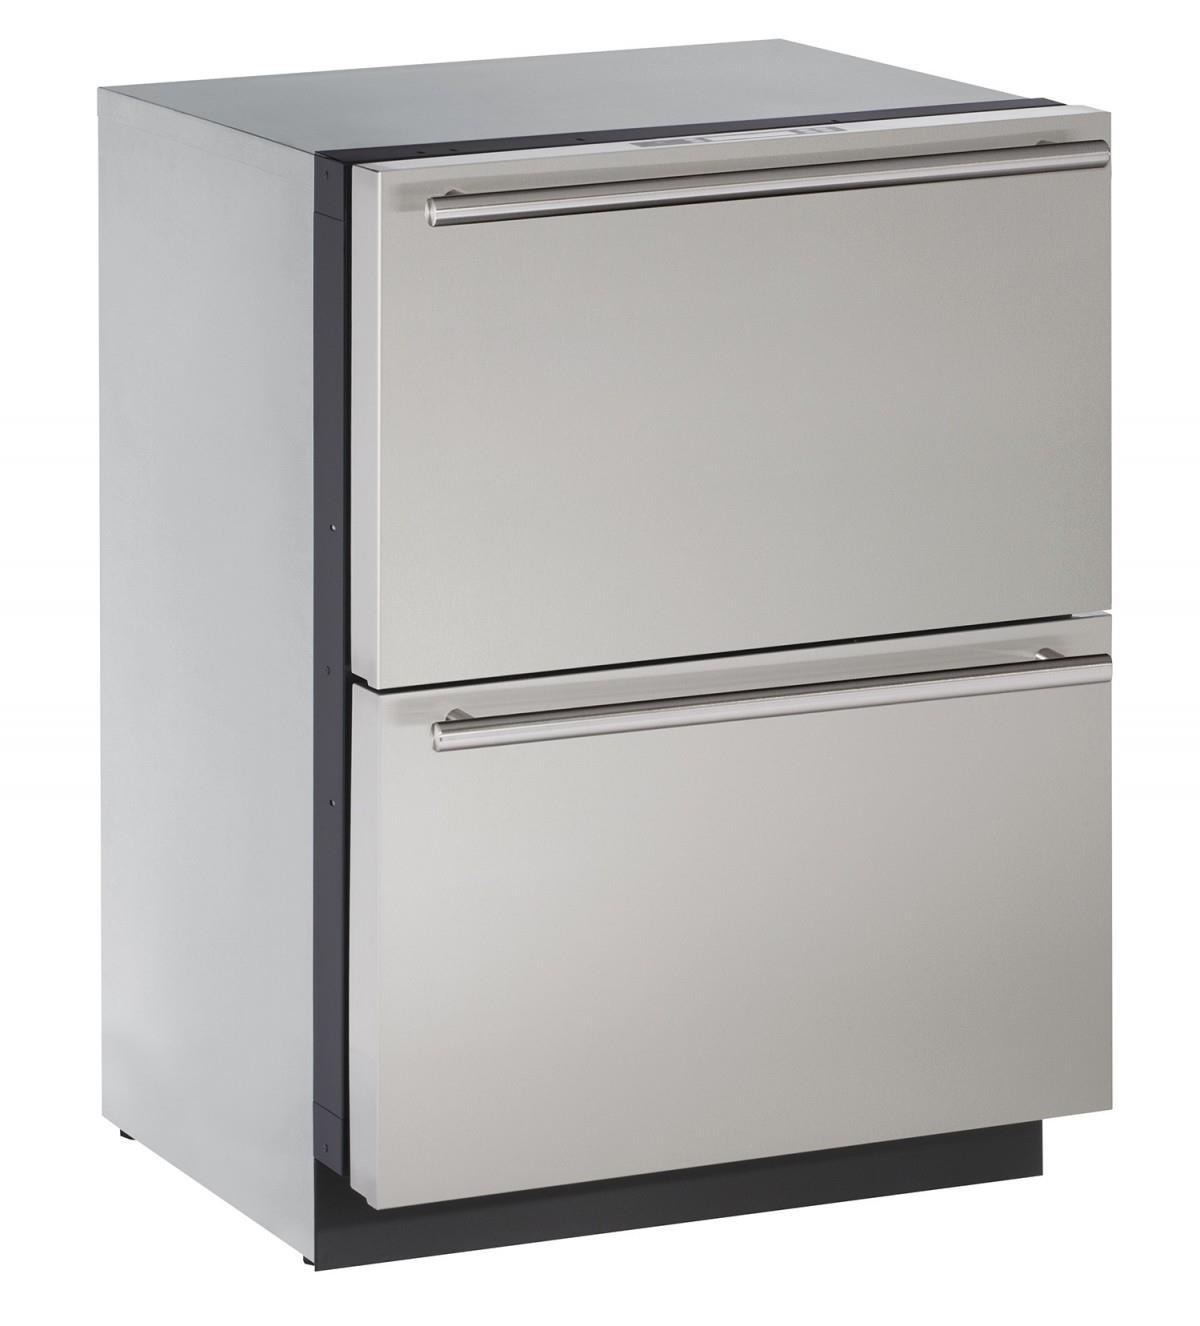 U-Line Refrigerators 4.5 cu. ft. Built-in Two Drawer Refrigerator - Item Number: U-3024DWRS-00A